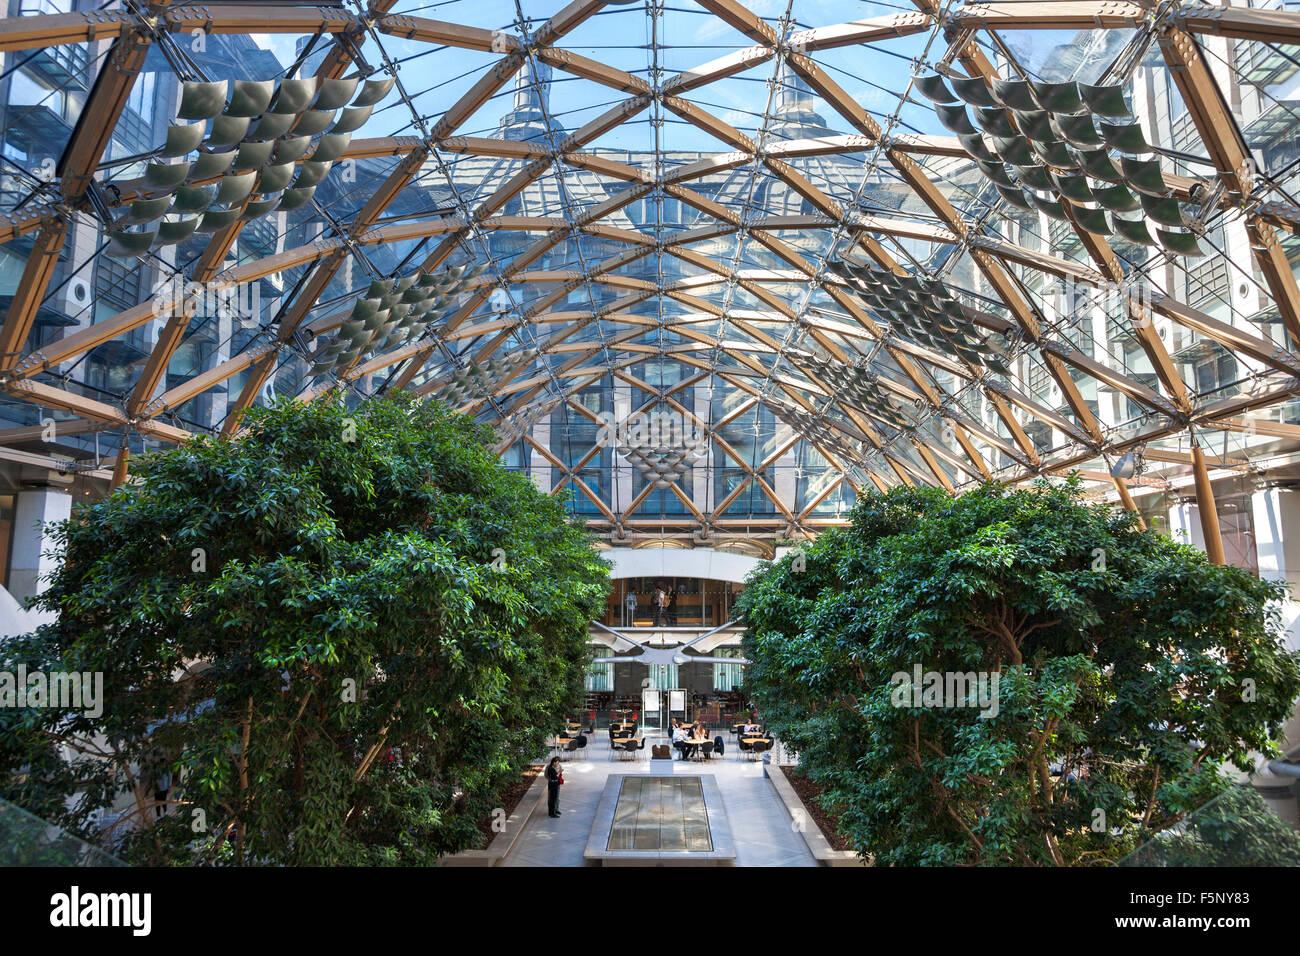 Interior Atrium Of Portcullis House In Westminster, London, UK   Stock Image